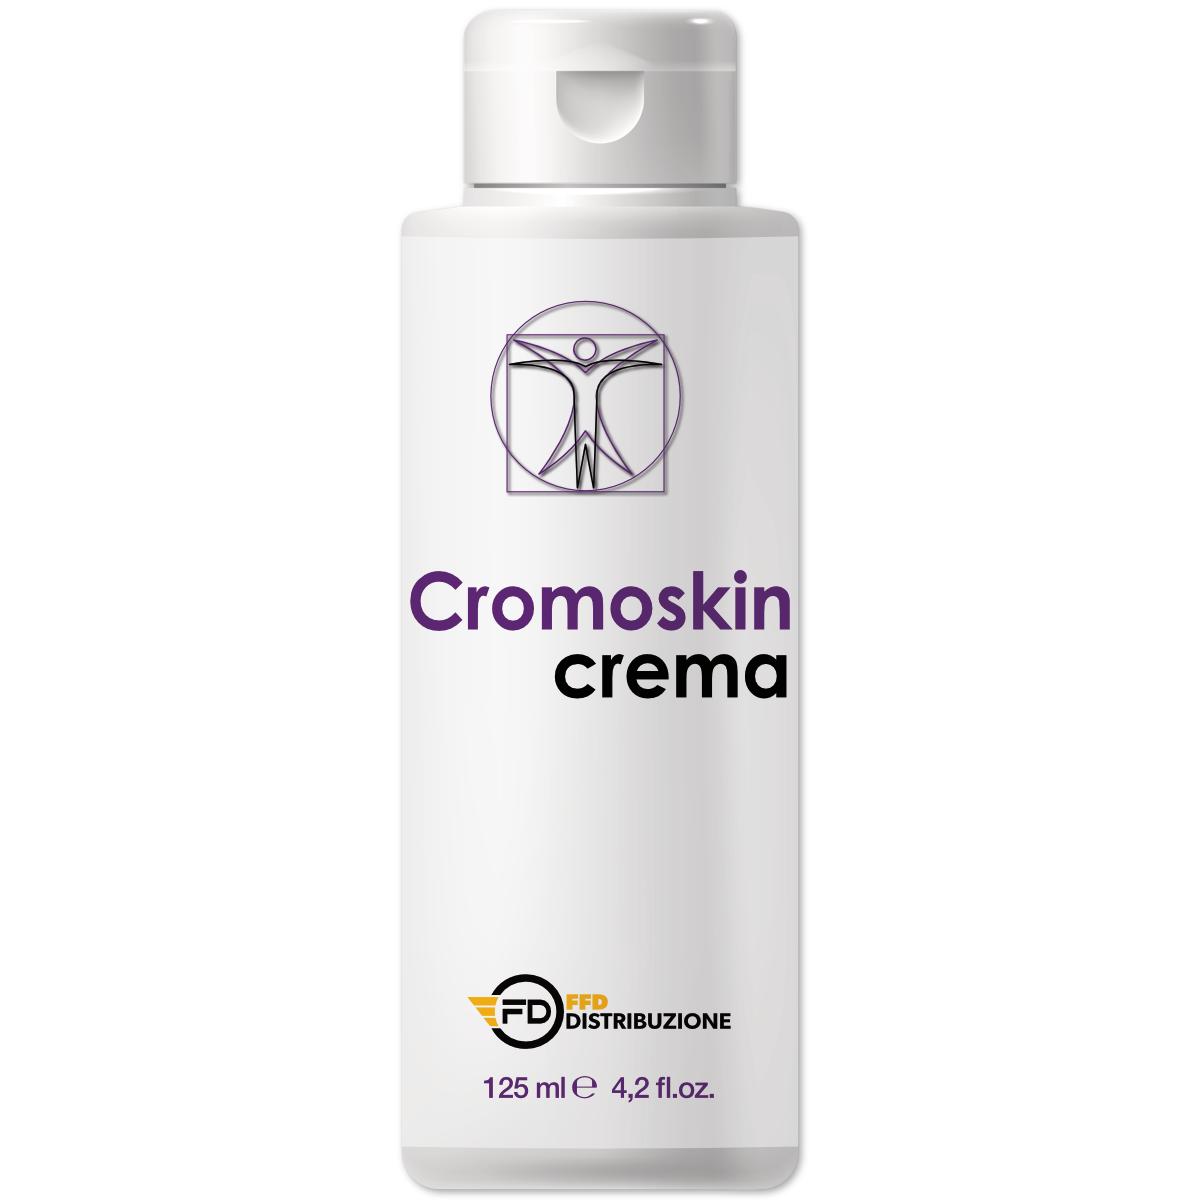 Cromoskin crema 125 ml